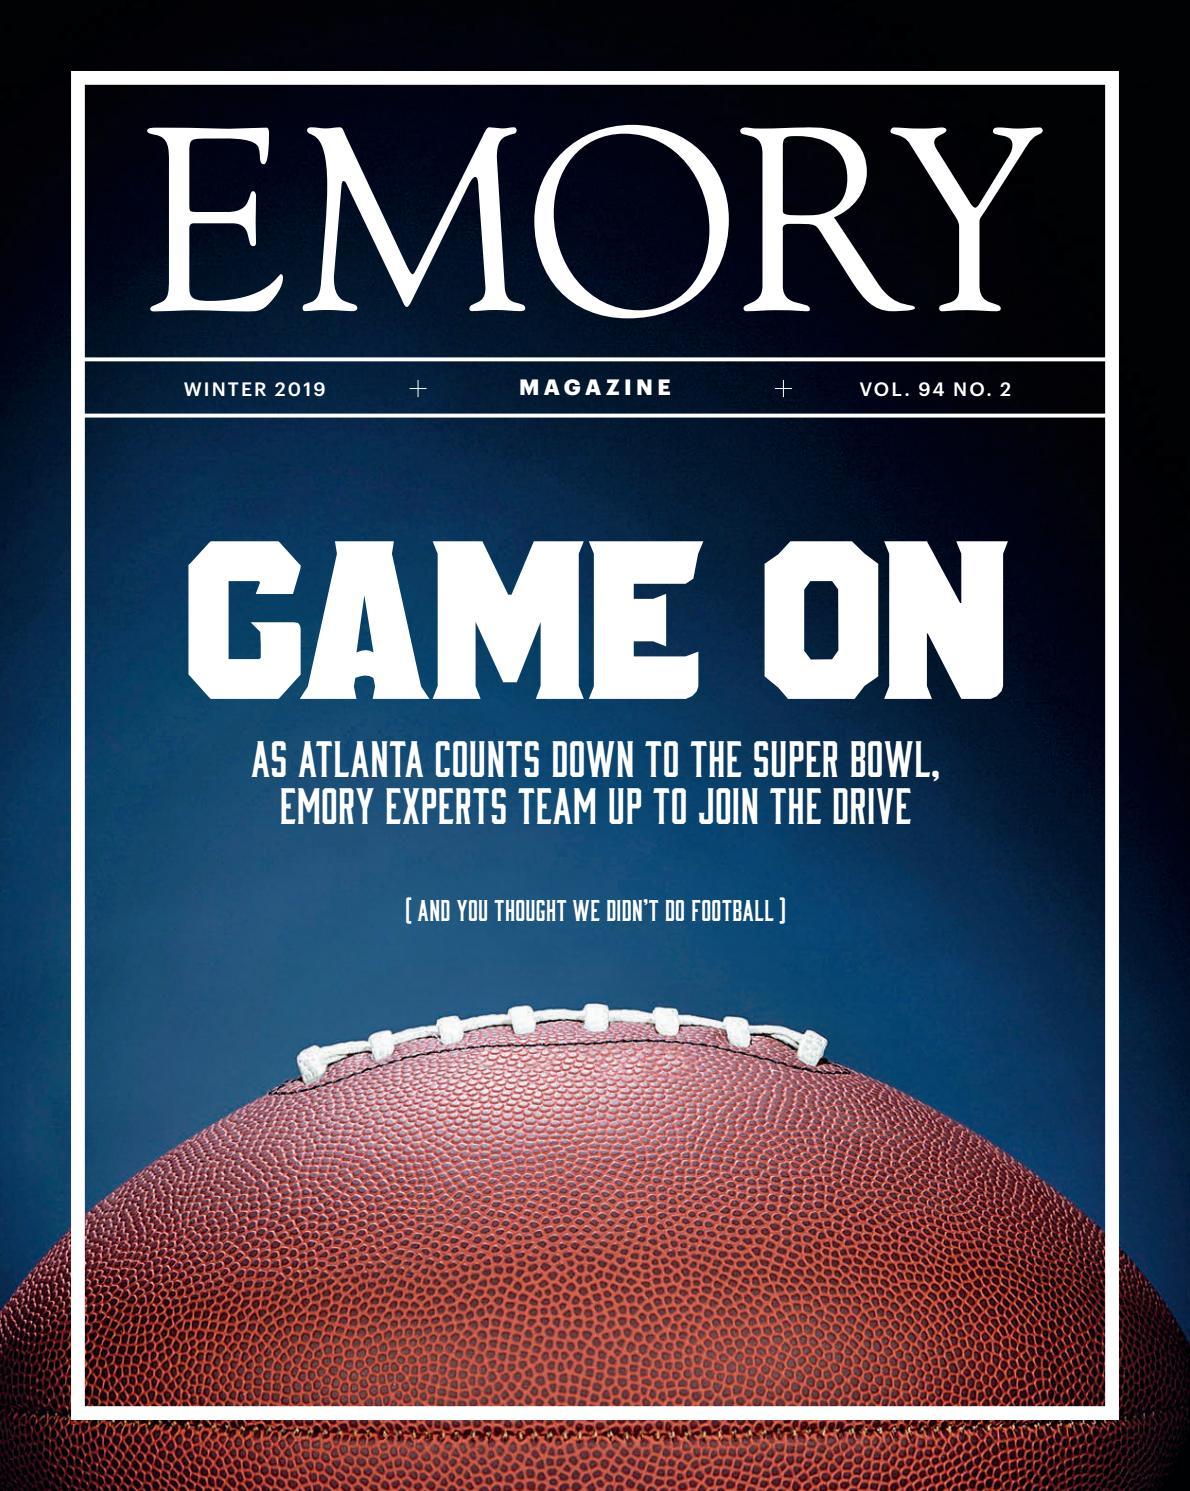 Emory Magazine Winter 2019 by Emory University - issuu